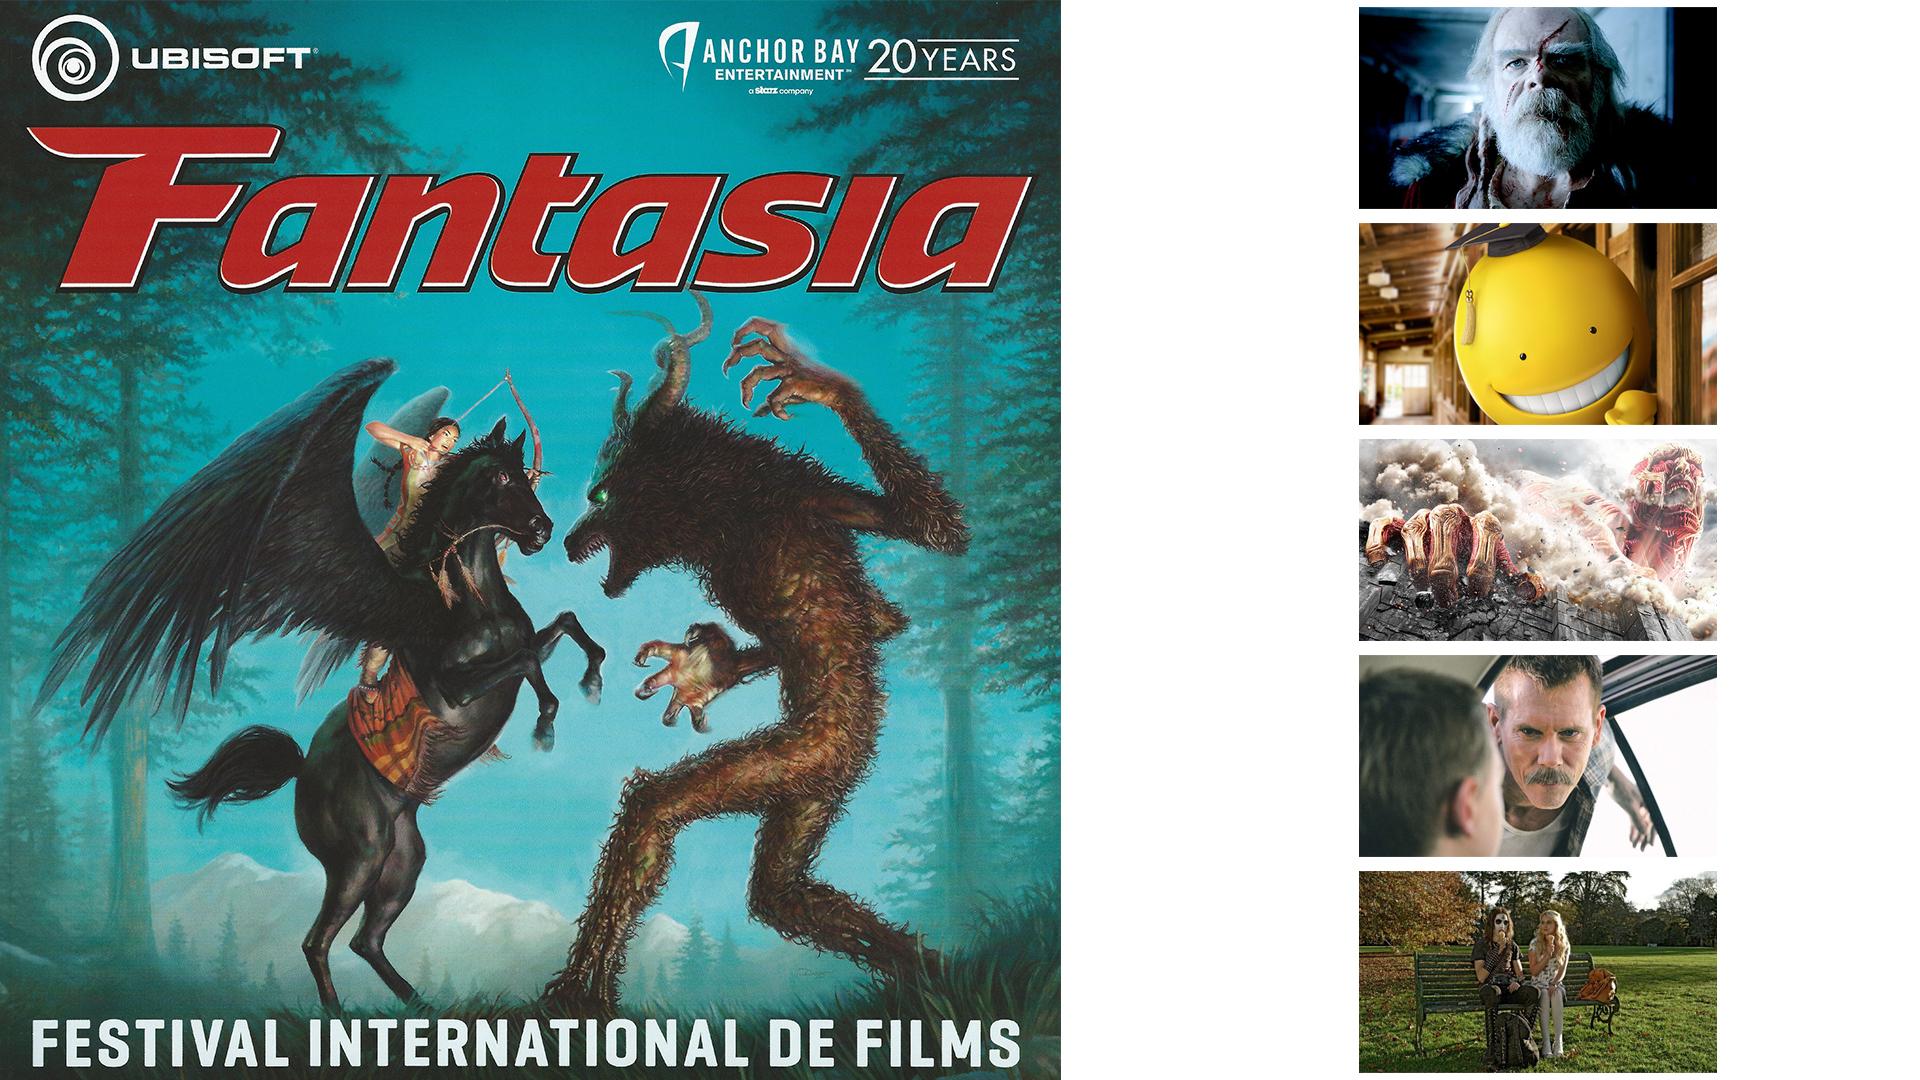 Fantasia, 5 août 2015